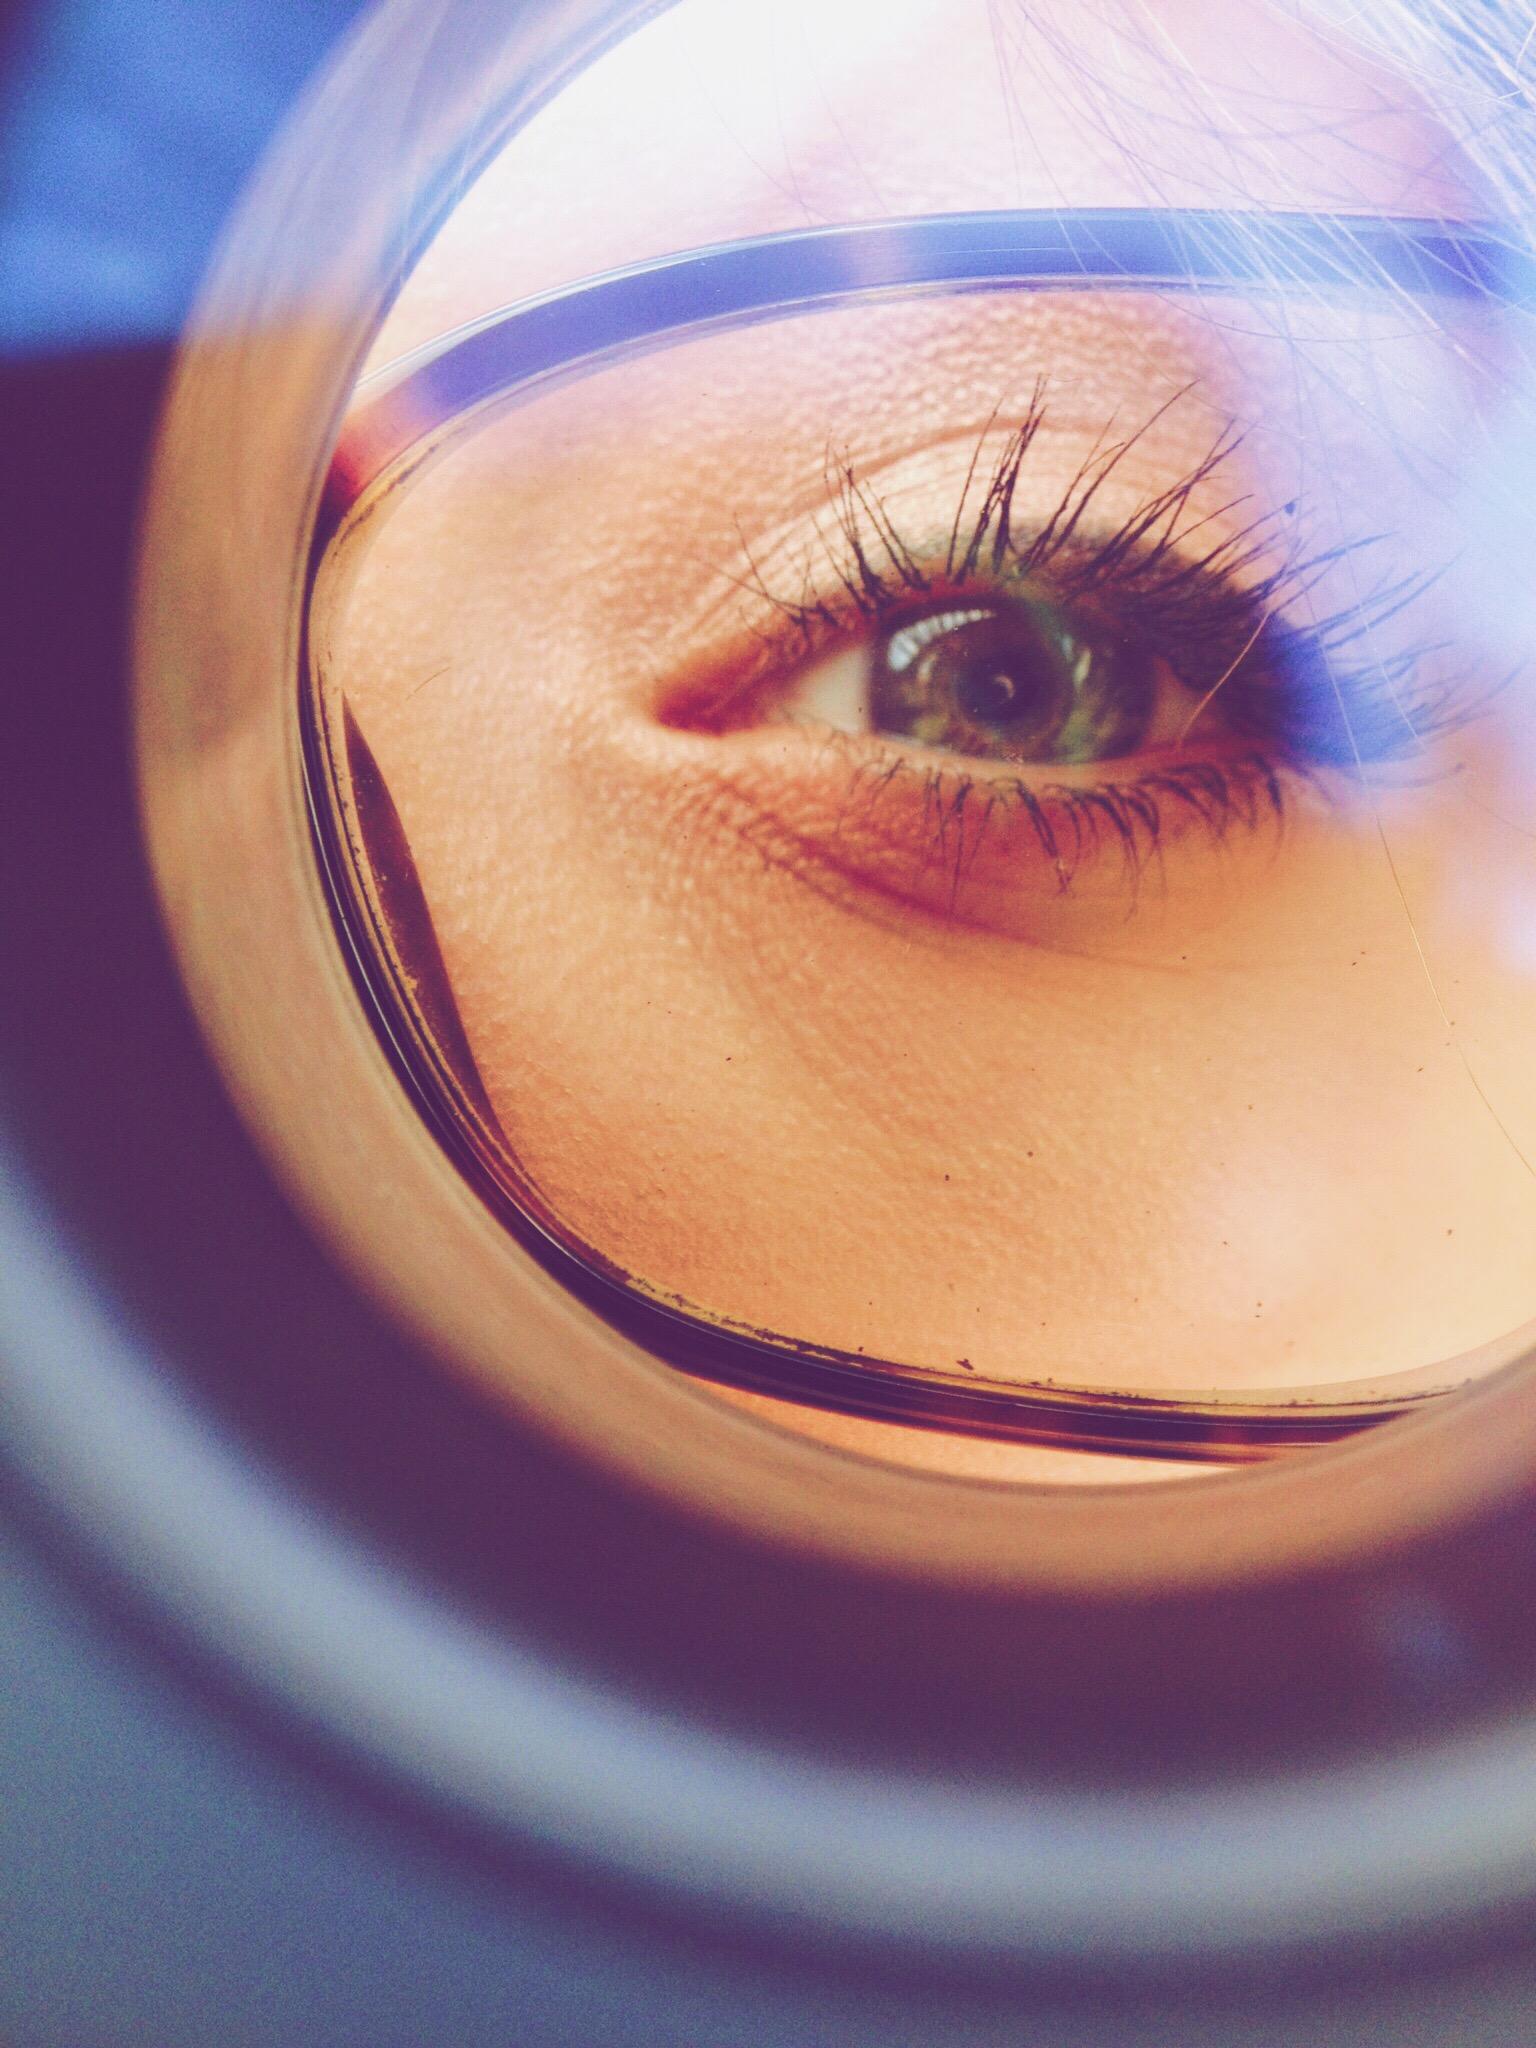 This is my eye shot through a loop.